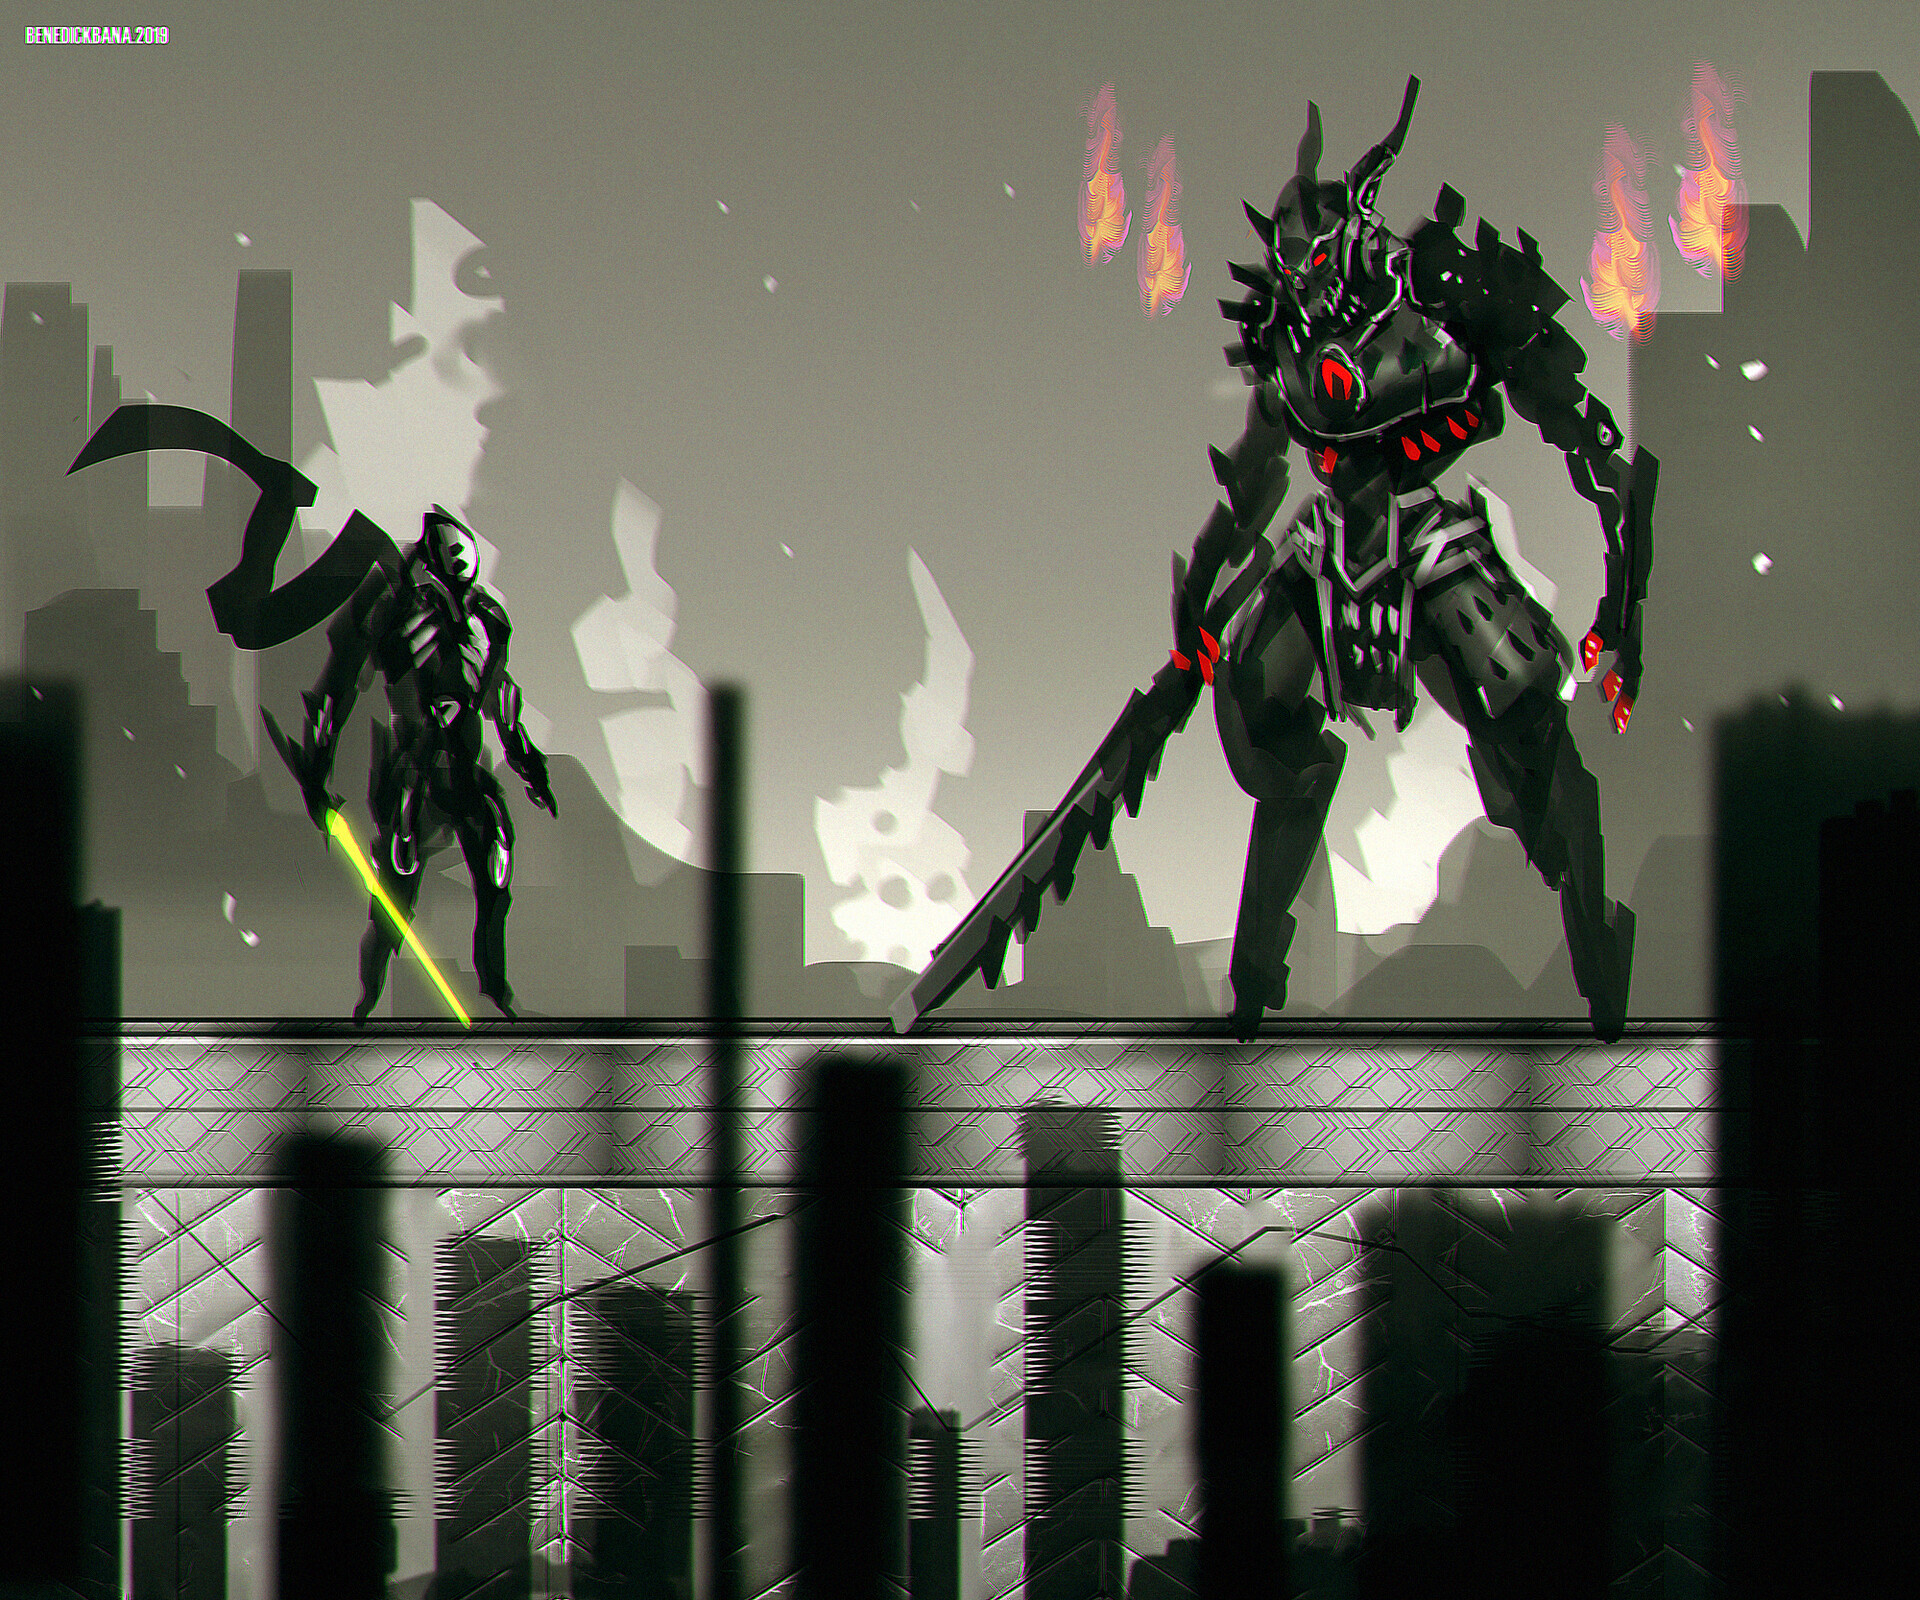 Darkfall 2D fighting game concept art